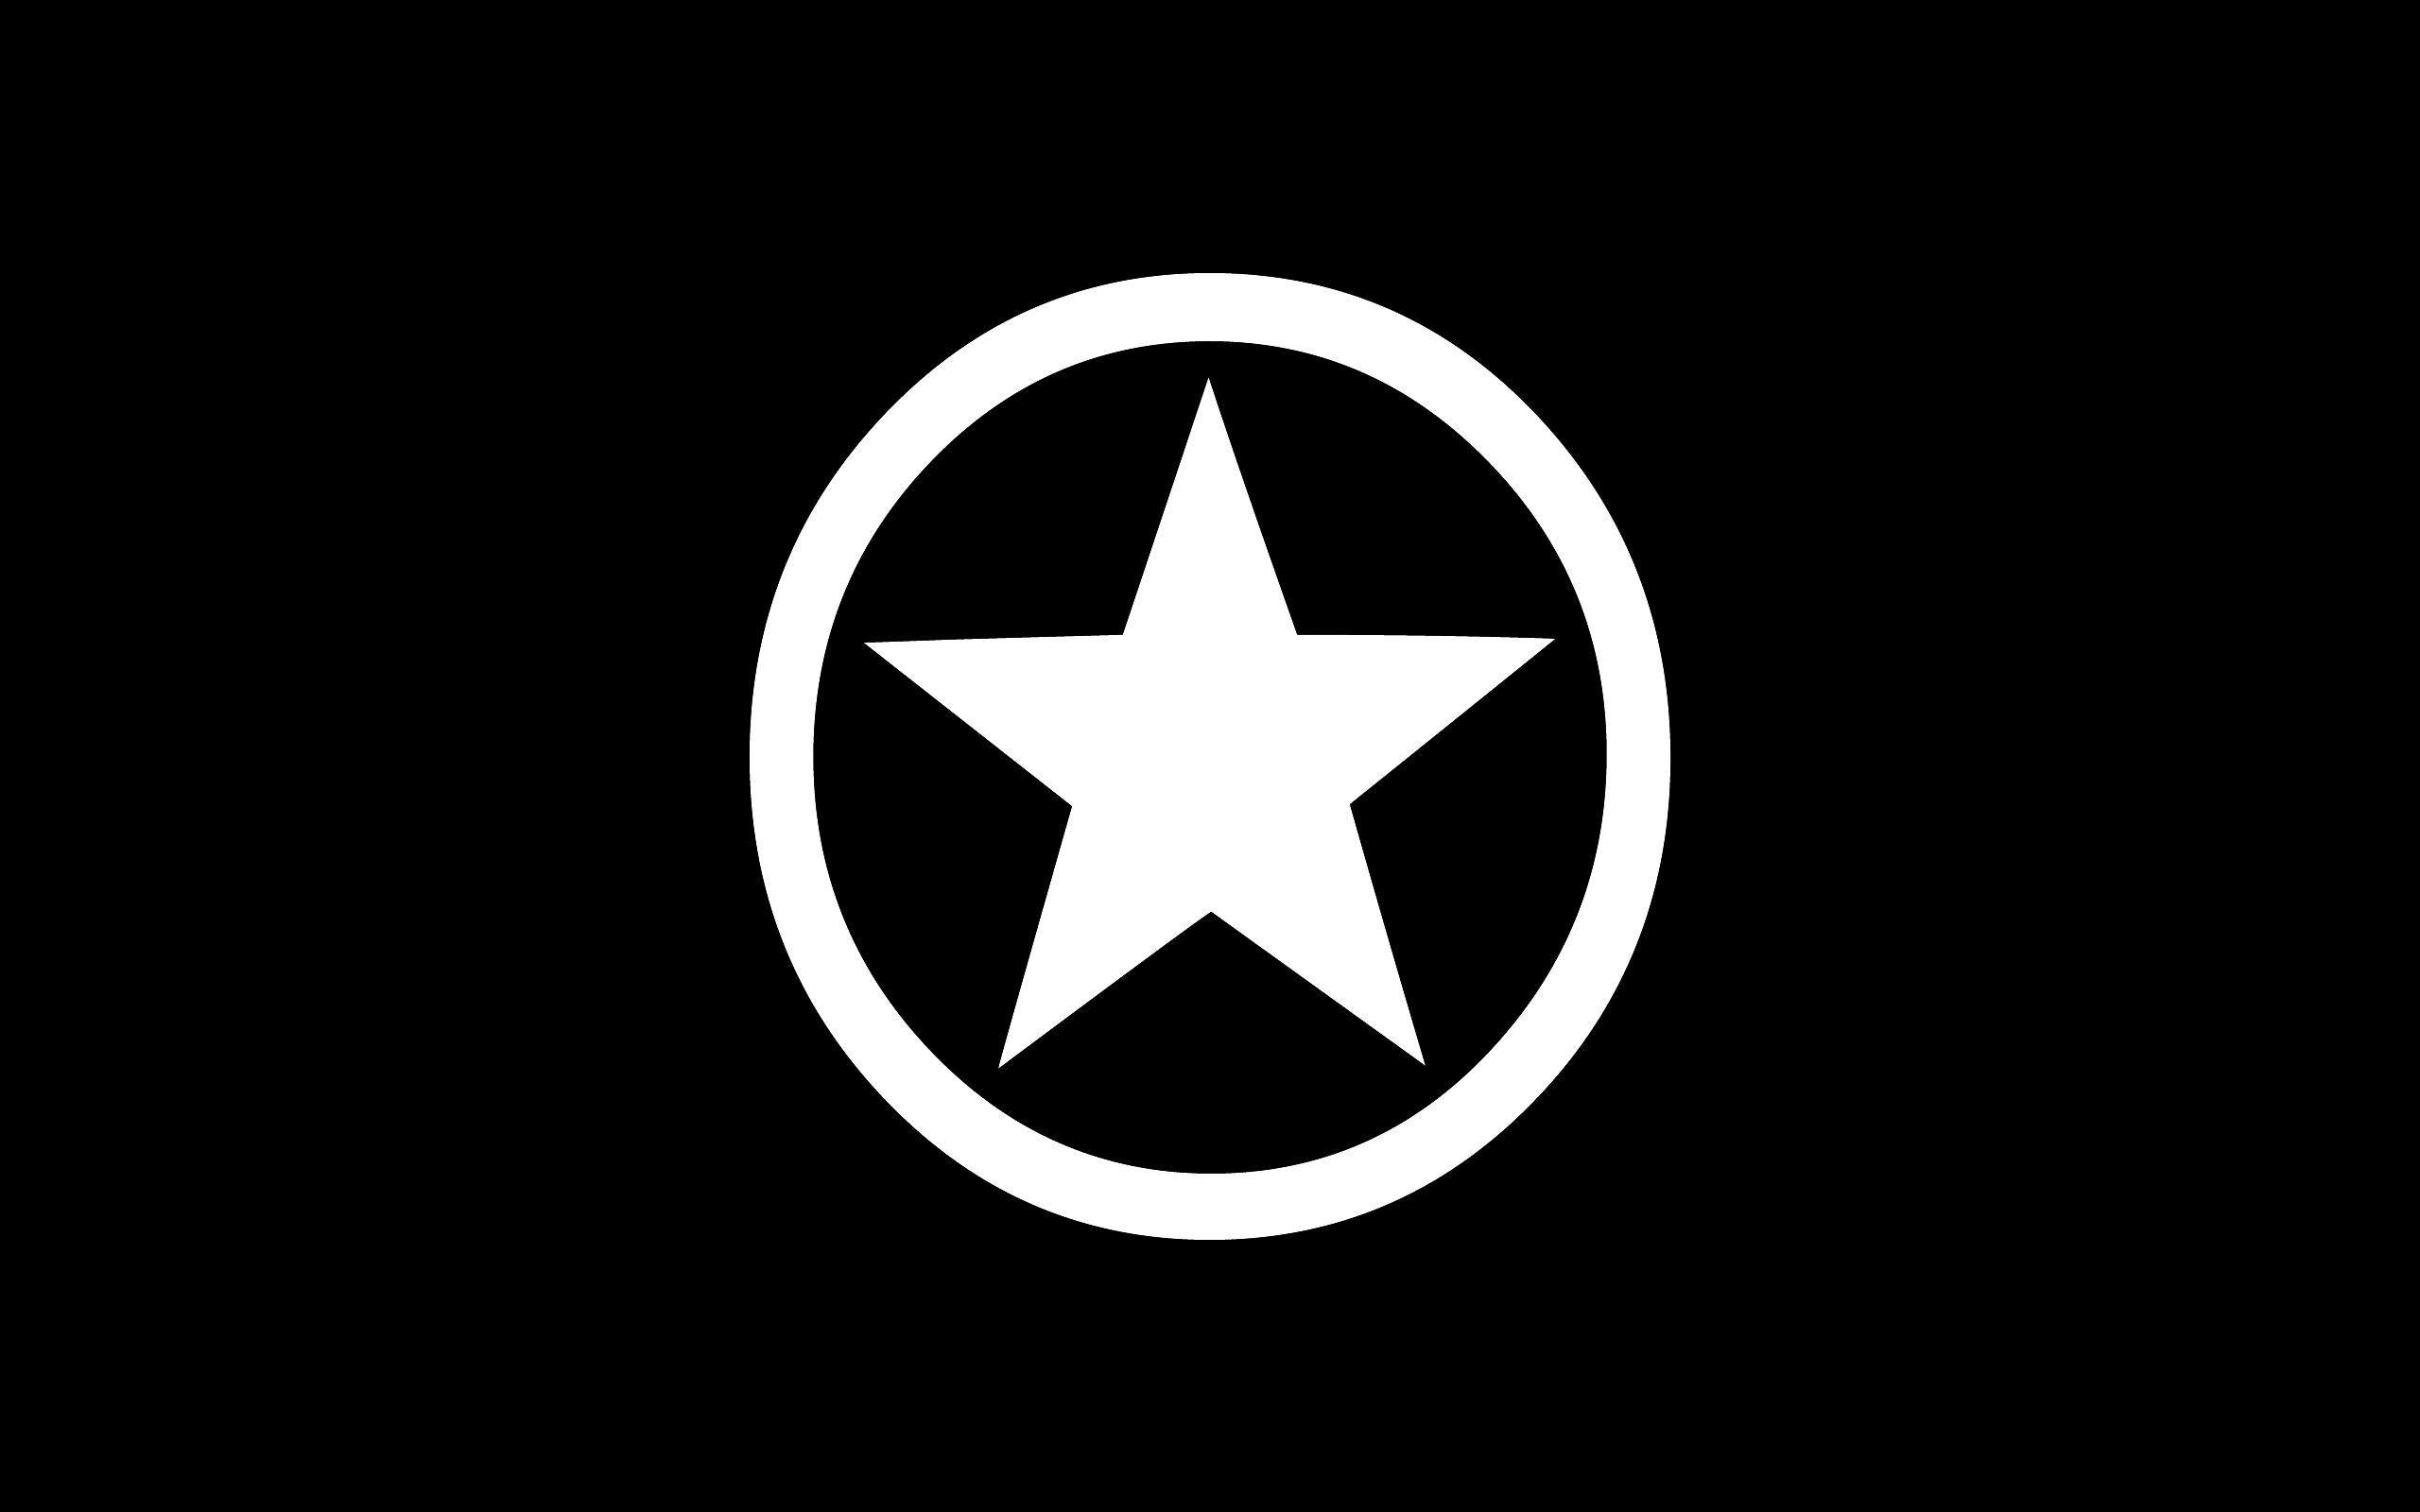 76 Converse All Star Wallpaper On Wallpapersafari